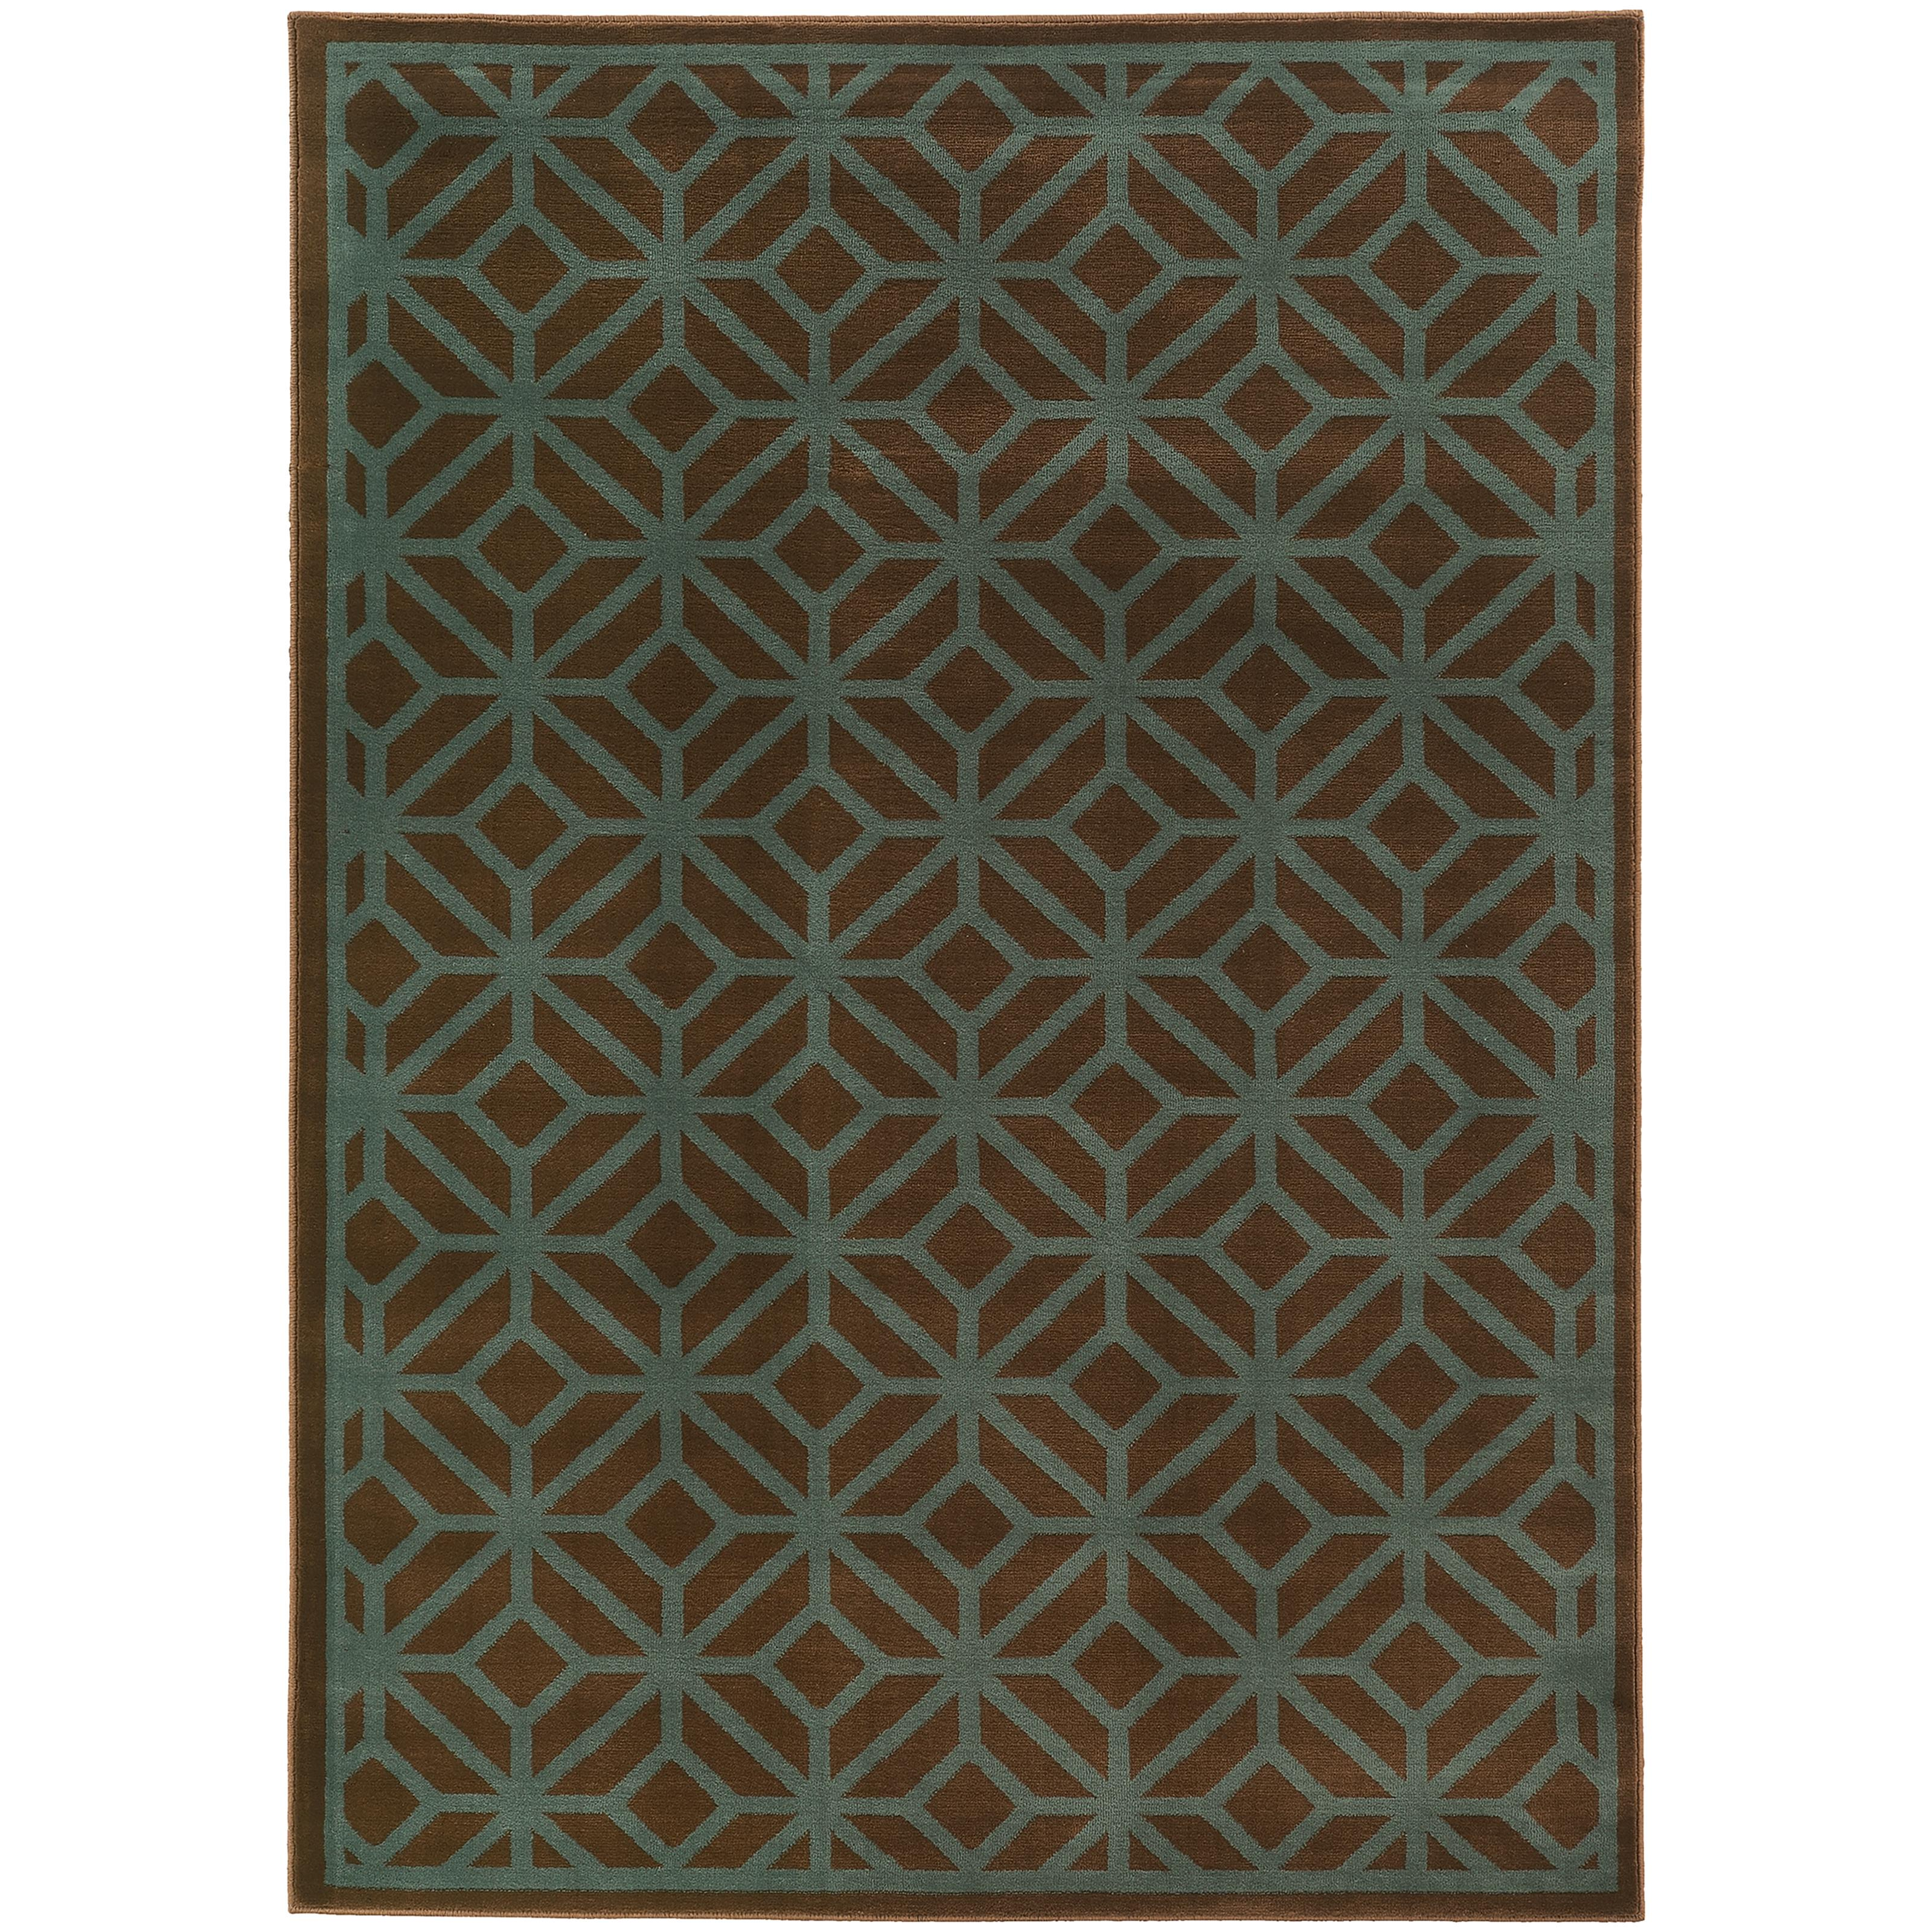 "Oriental Weavers Ella 7'10"" X 10' 0"" Rug - Item Number: E5188D240305ST"